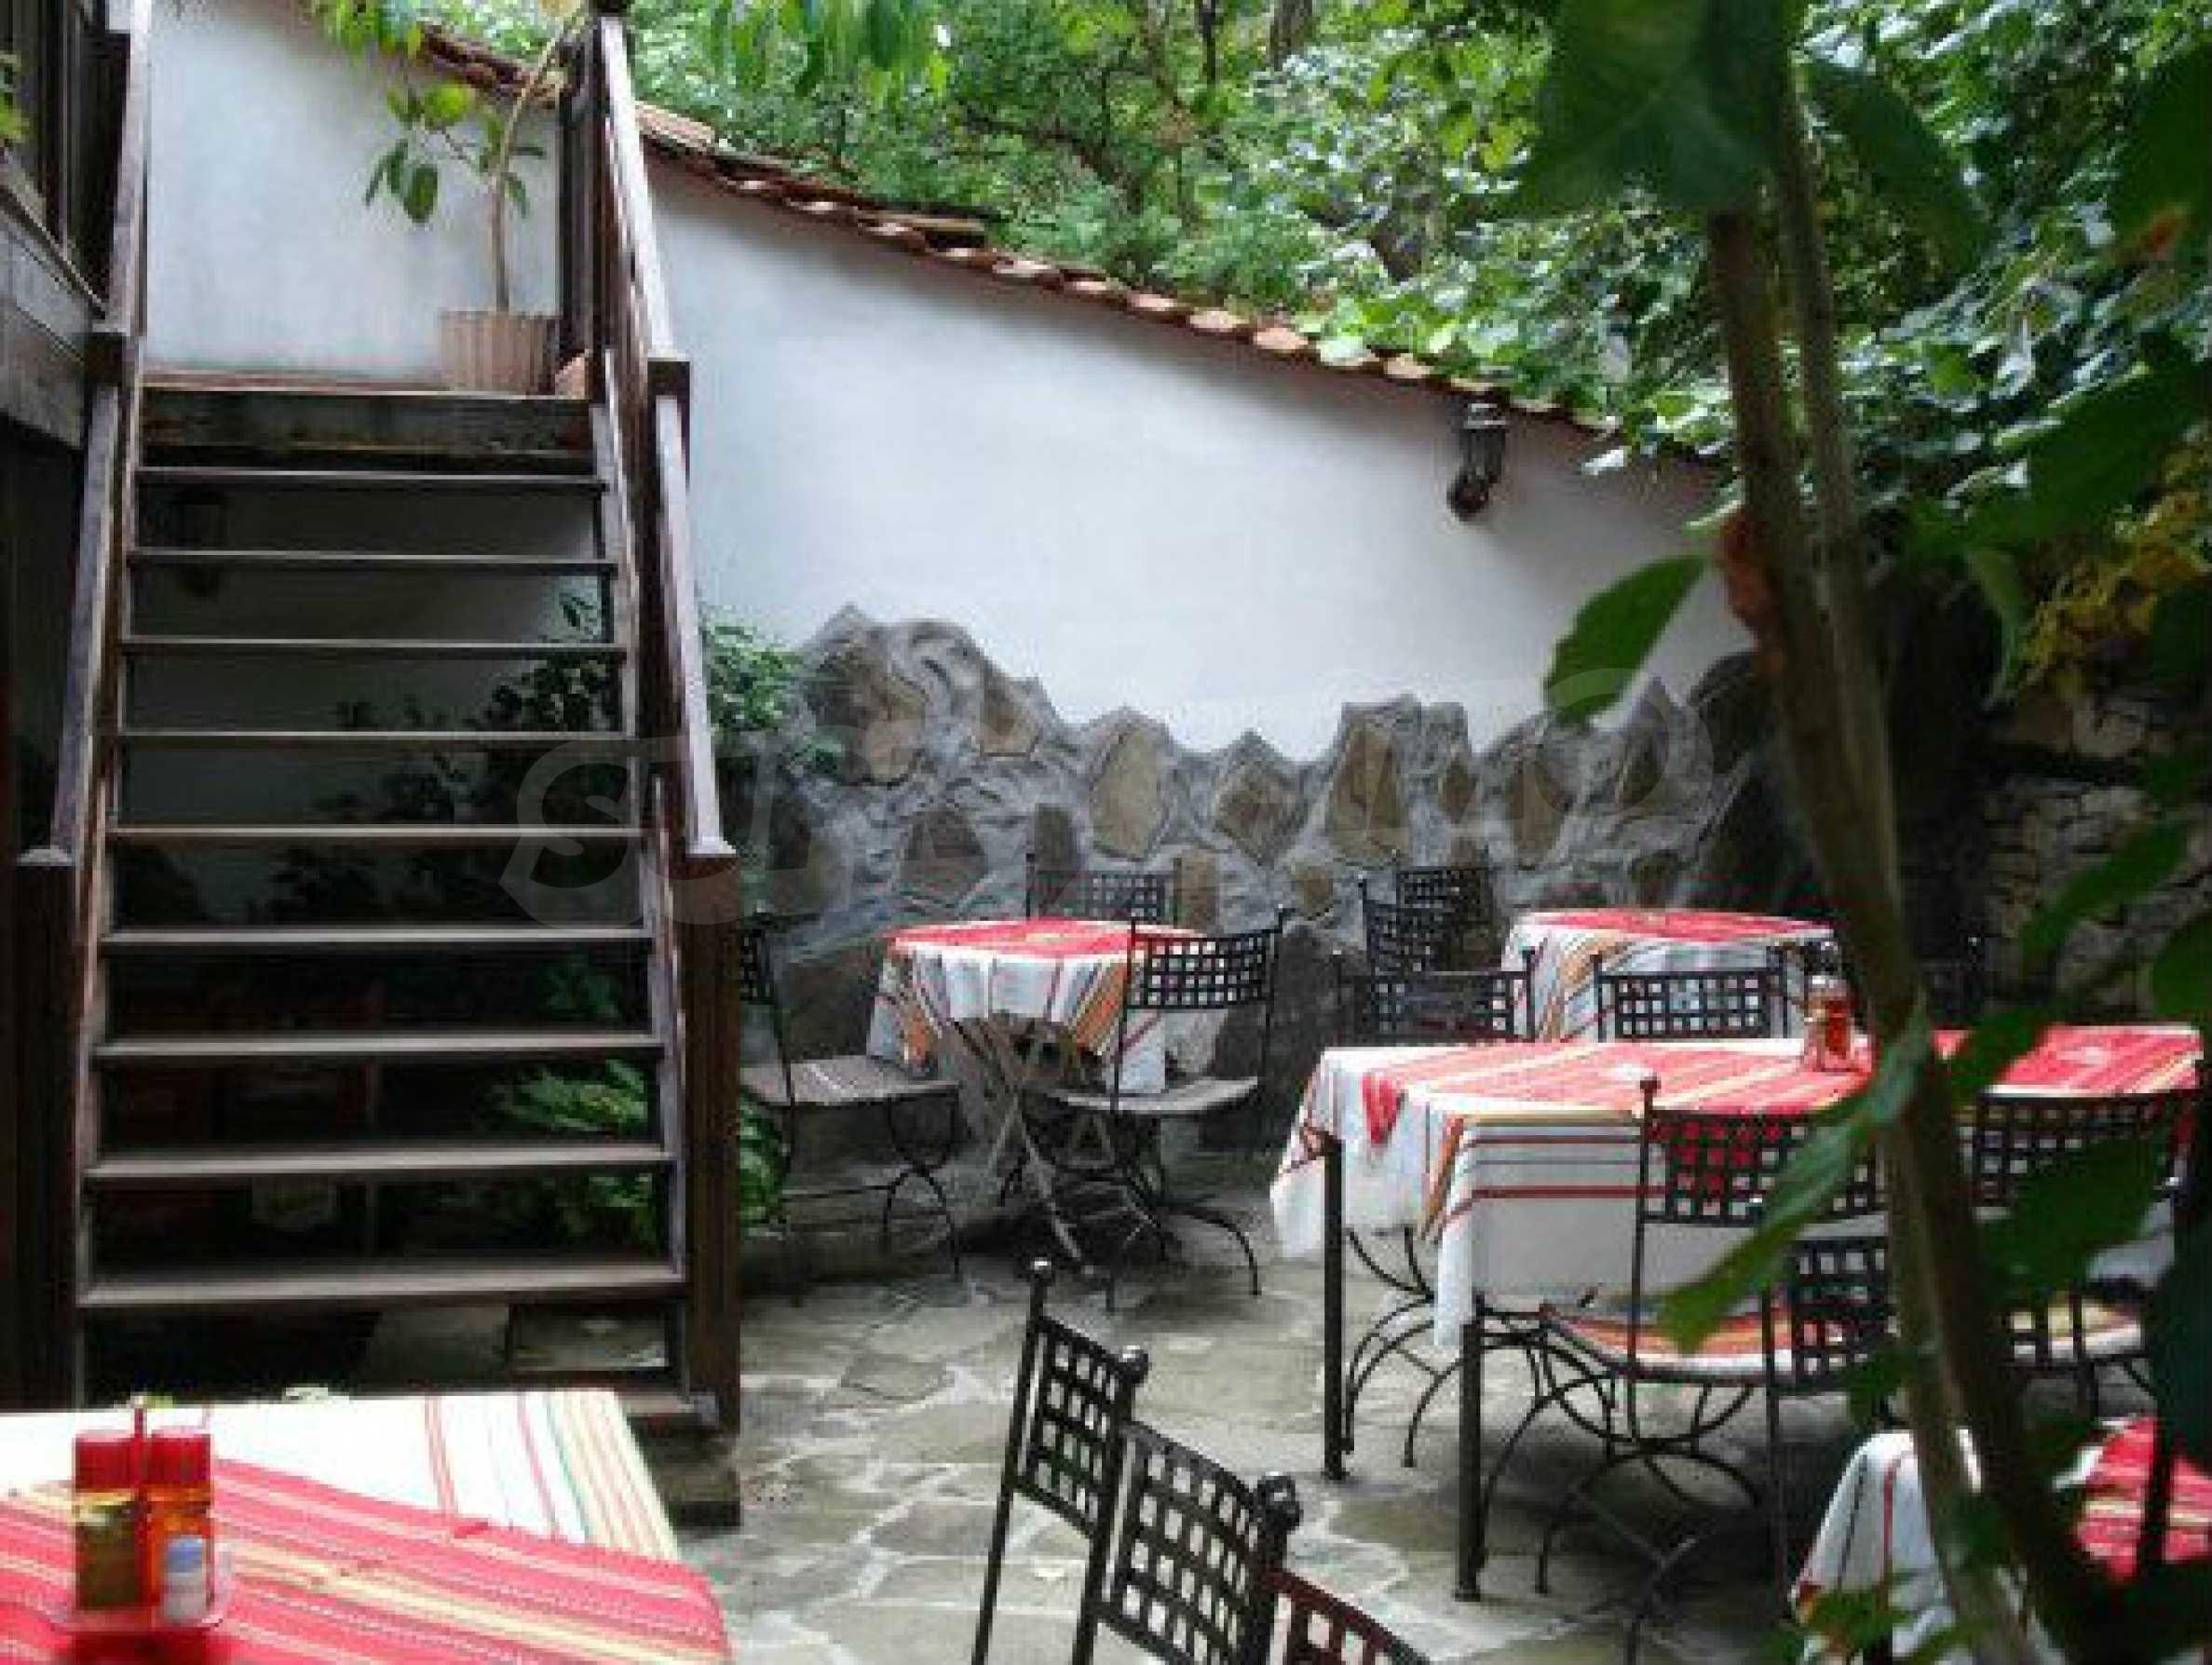 Hotelanlage mit Restaurant am Ufer des Flusses Osam in Lovech 60